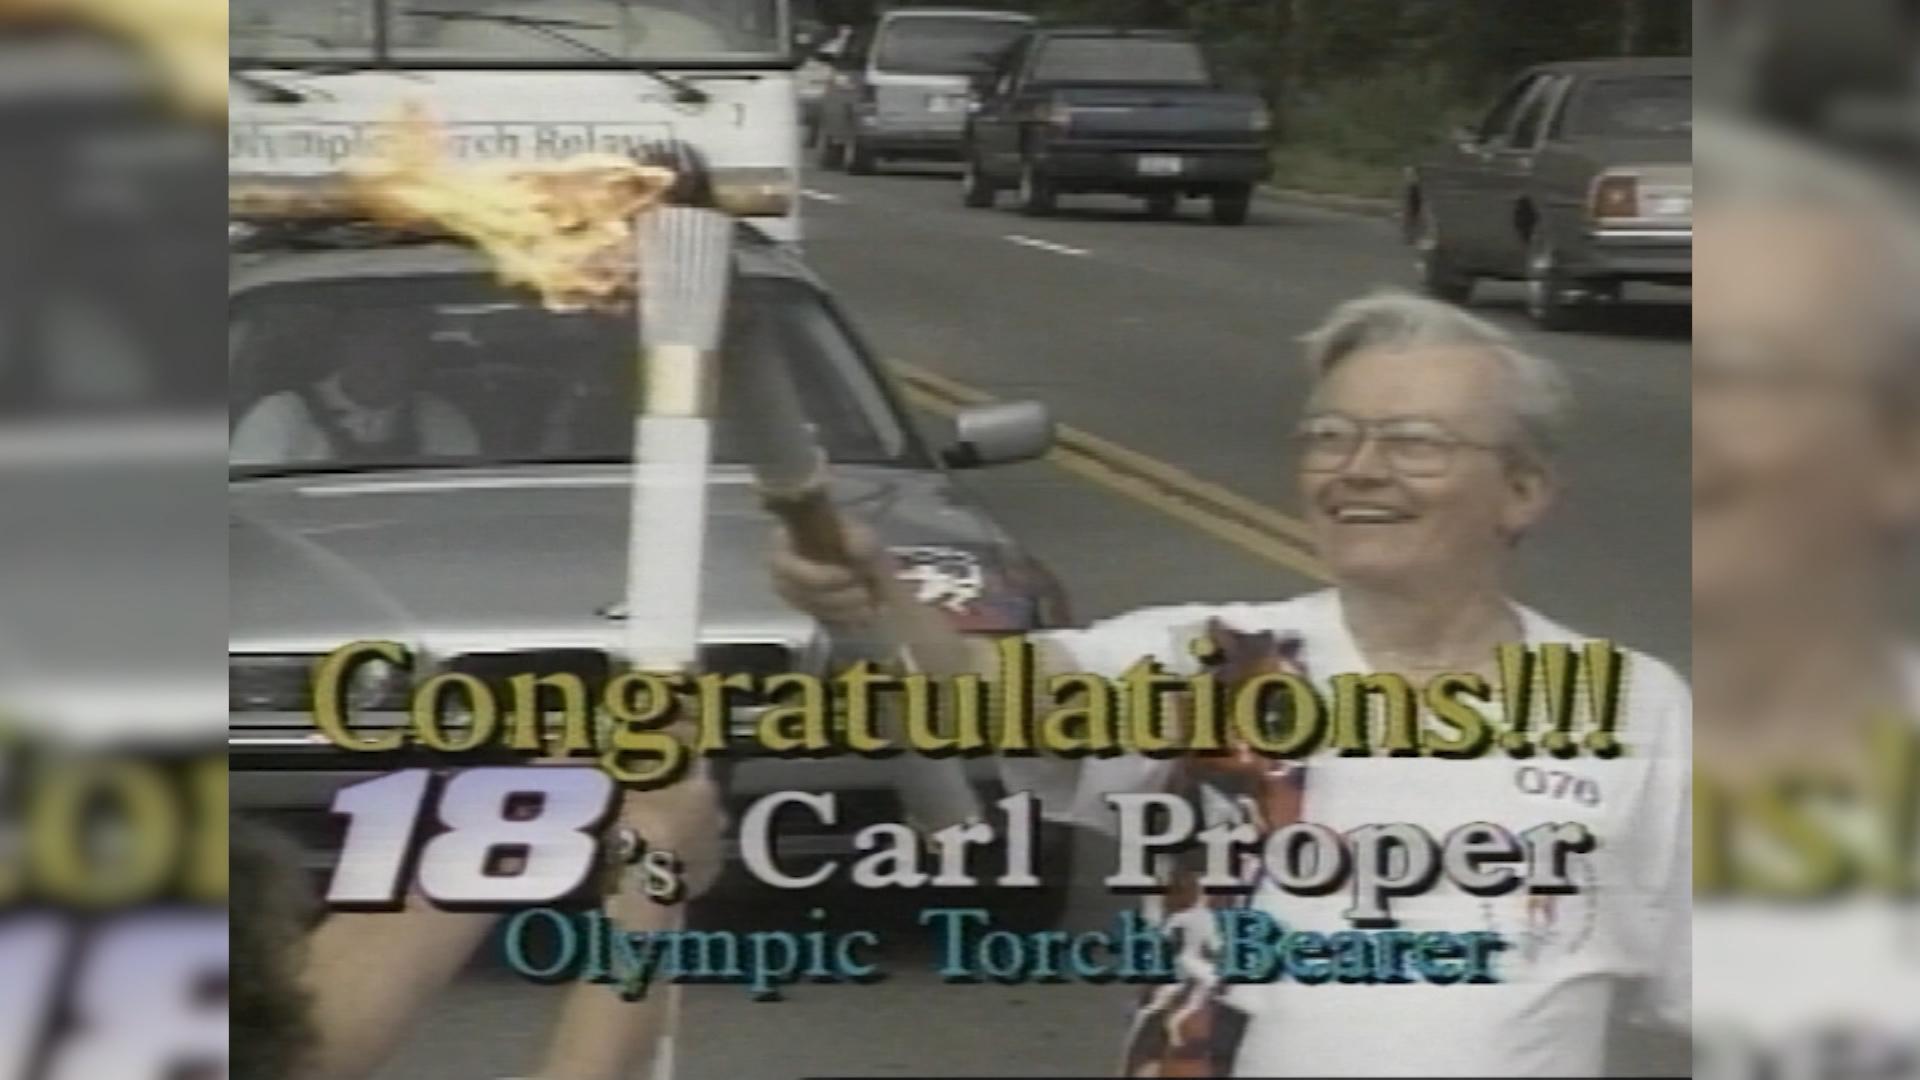 Carl Proper Olympic Torch Bearer